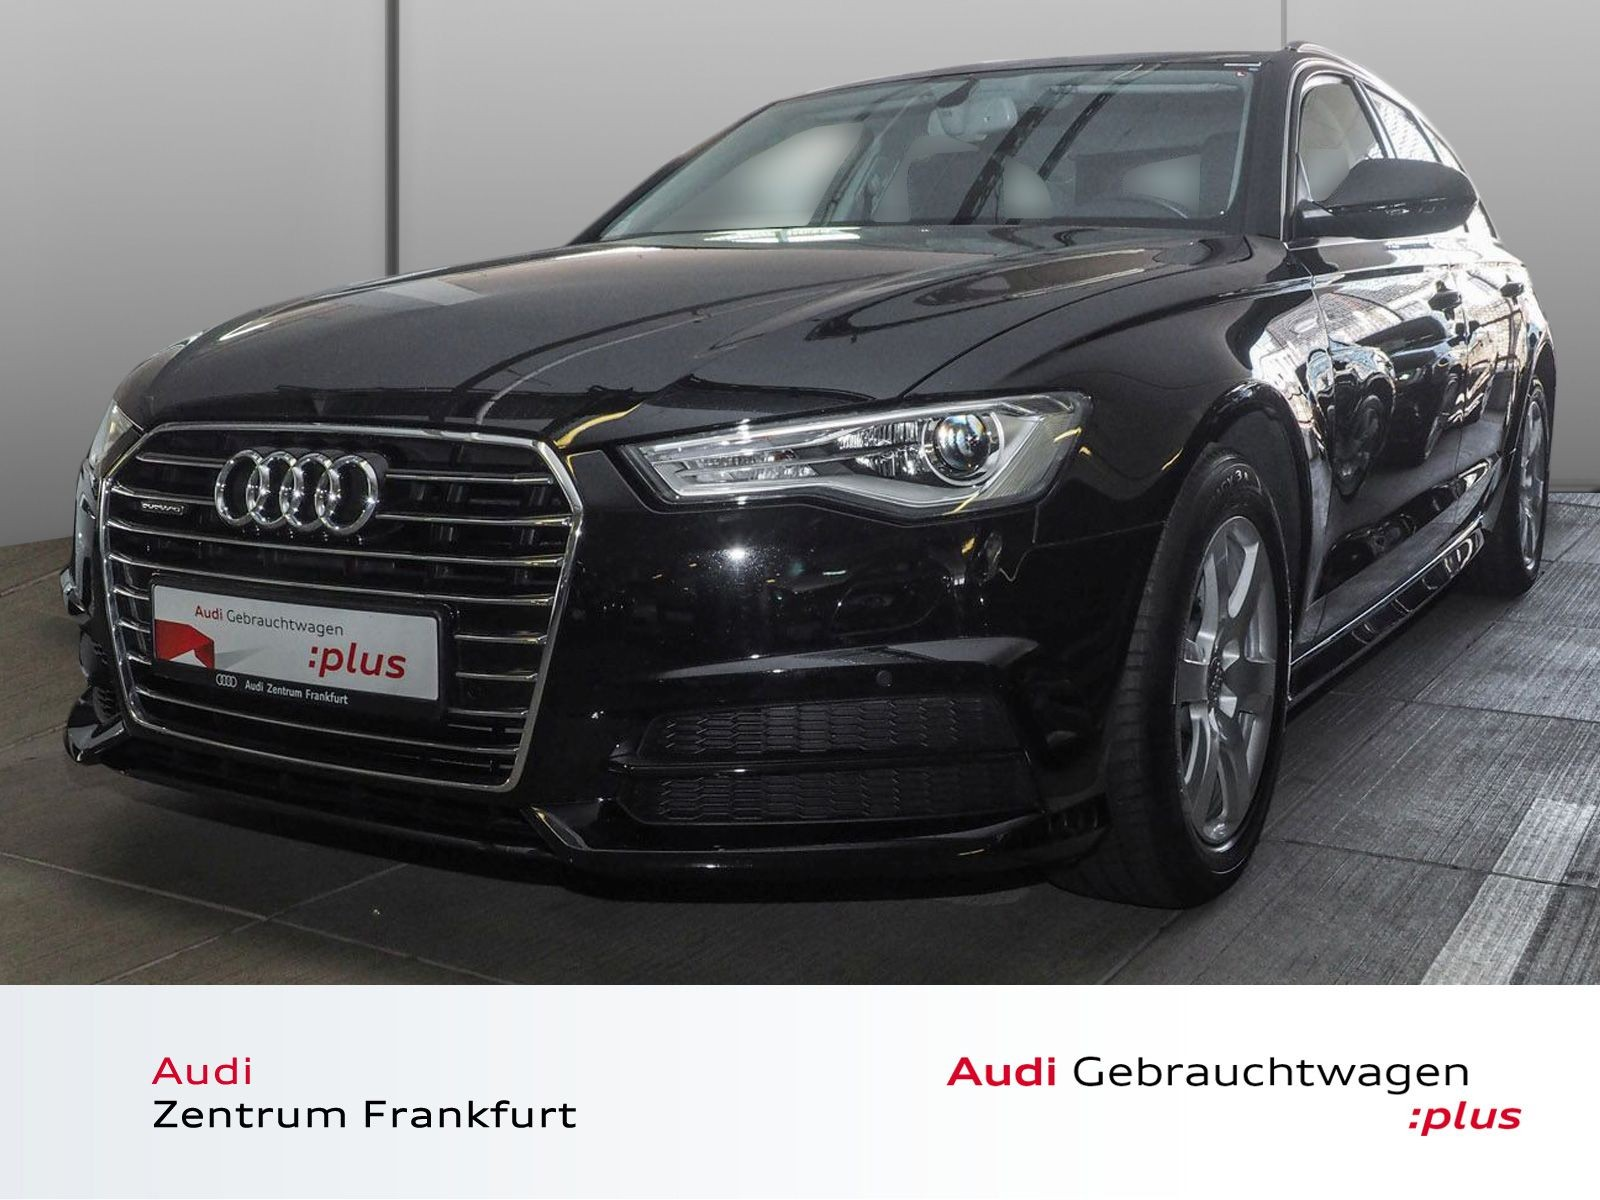 Audi A6 Avant 3.0 TDI quattro S tronic Navi Xenon Tempomat, Jahr 2018, Diesel